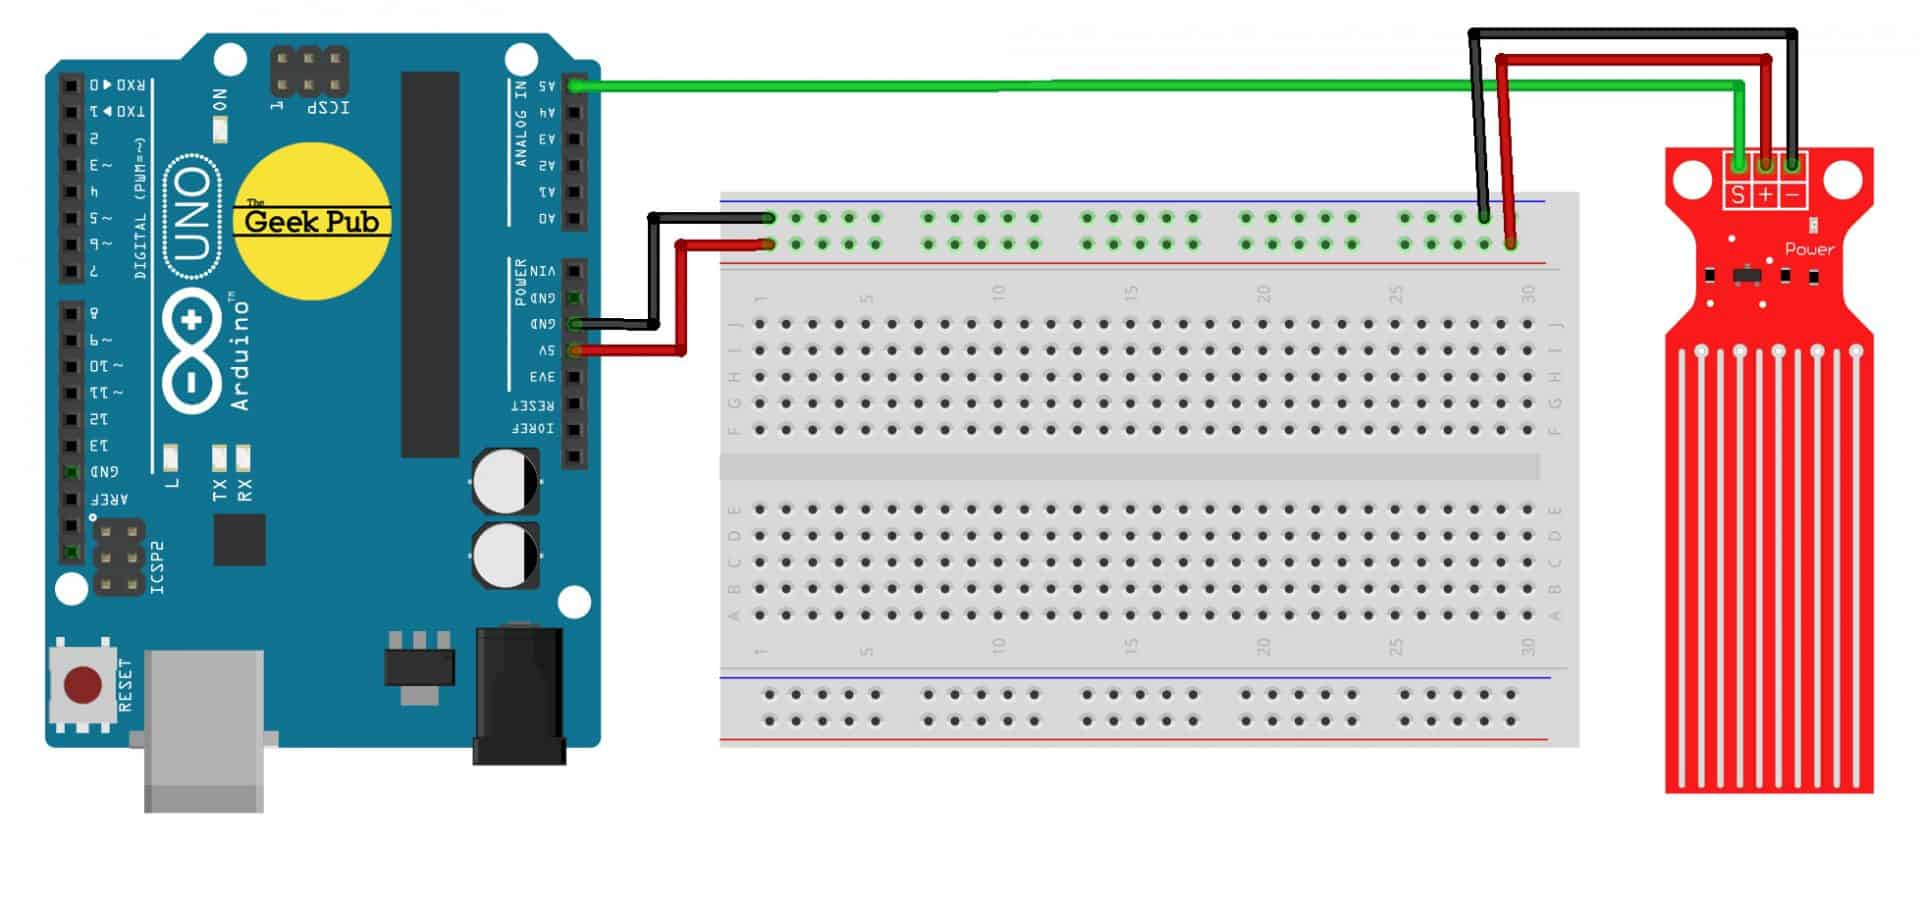 Arduino Water Level Sensor Tutorial - The Geek Pub on